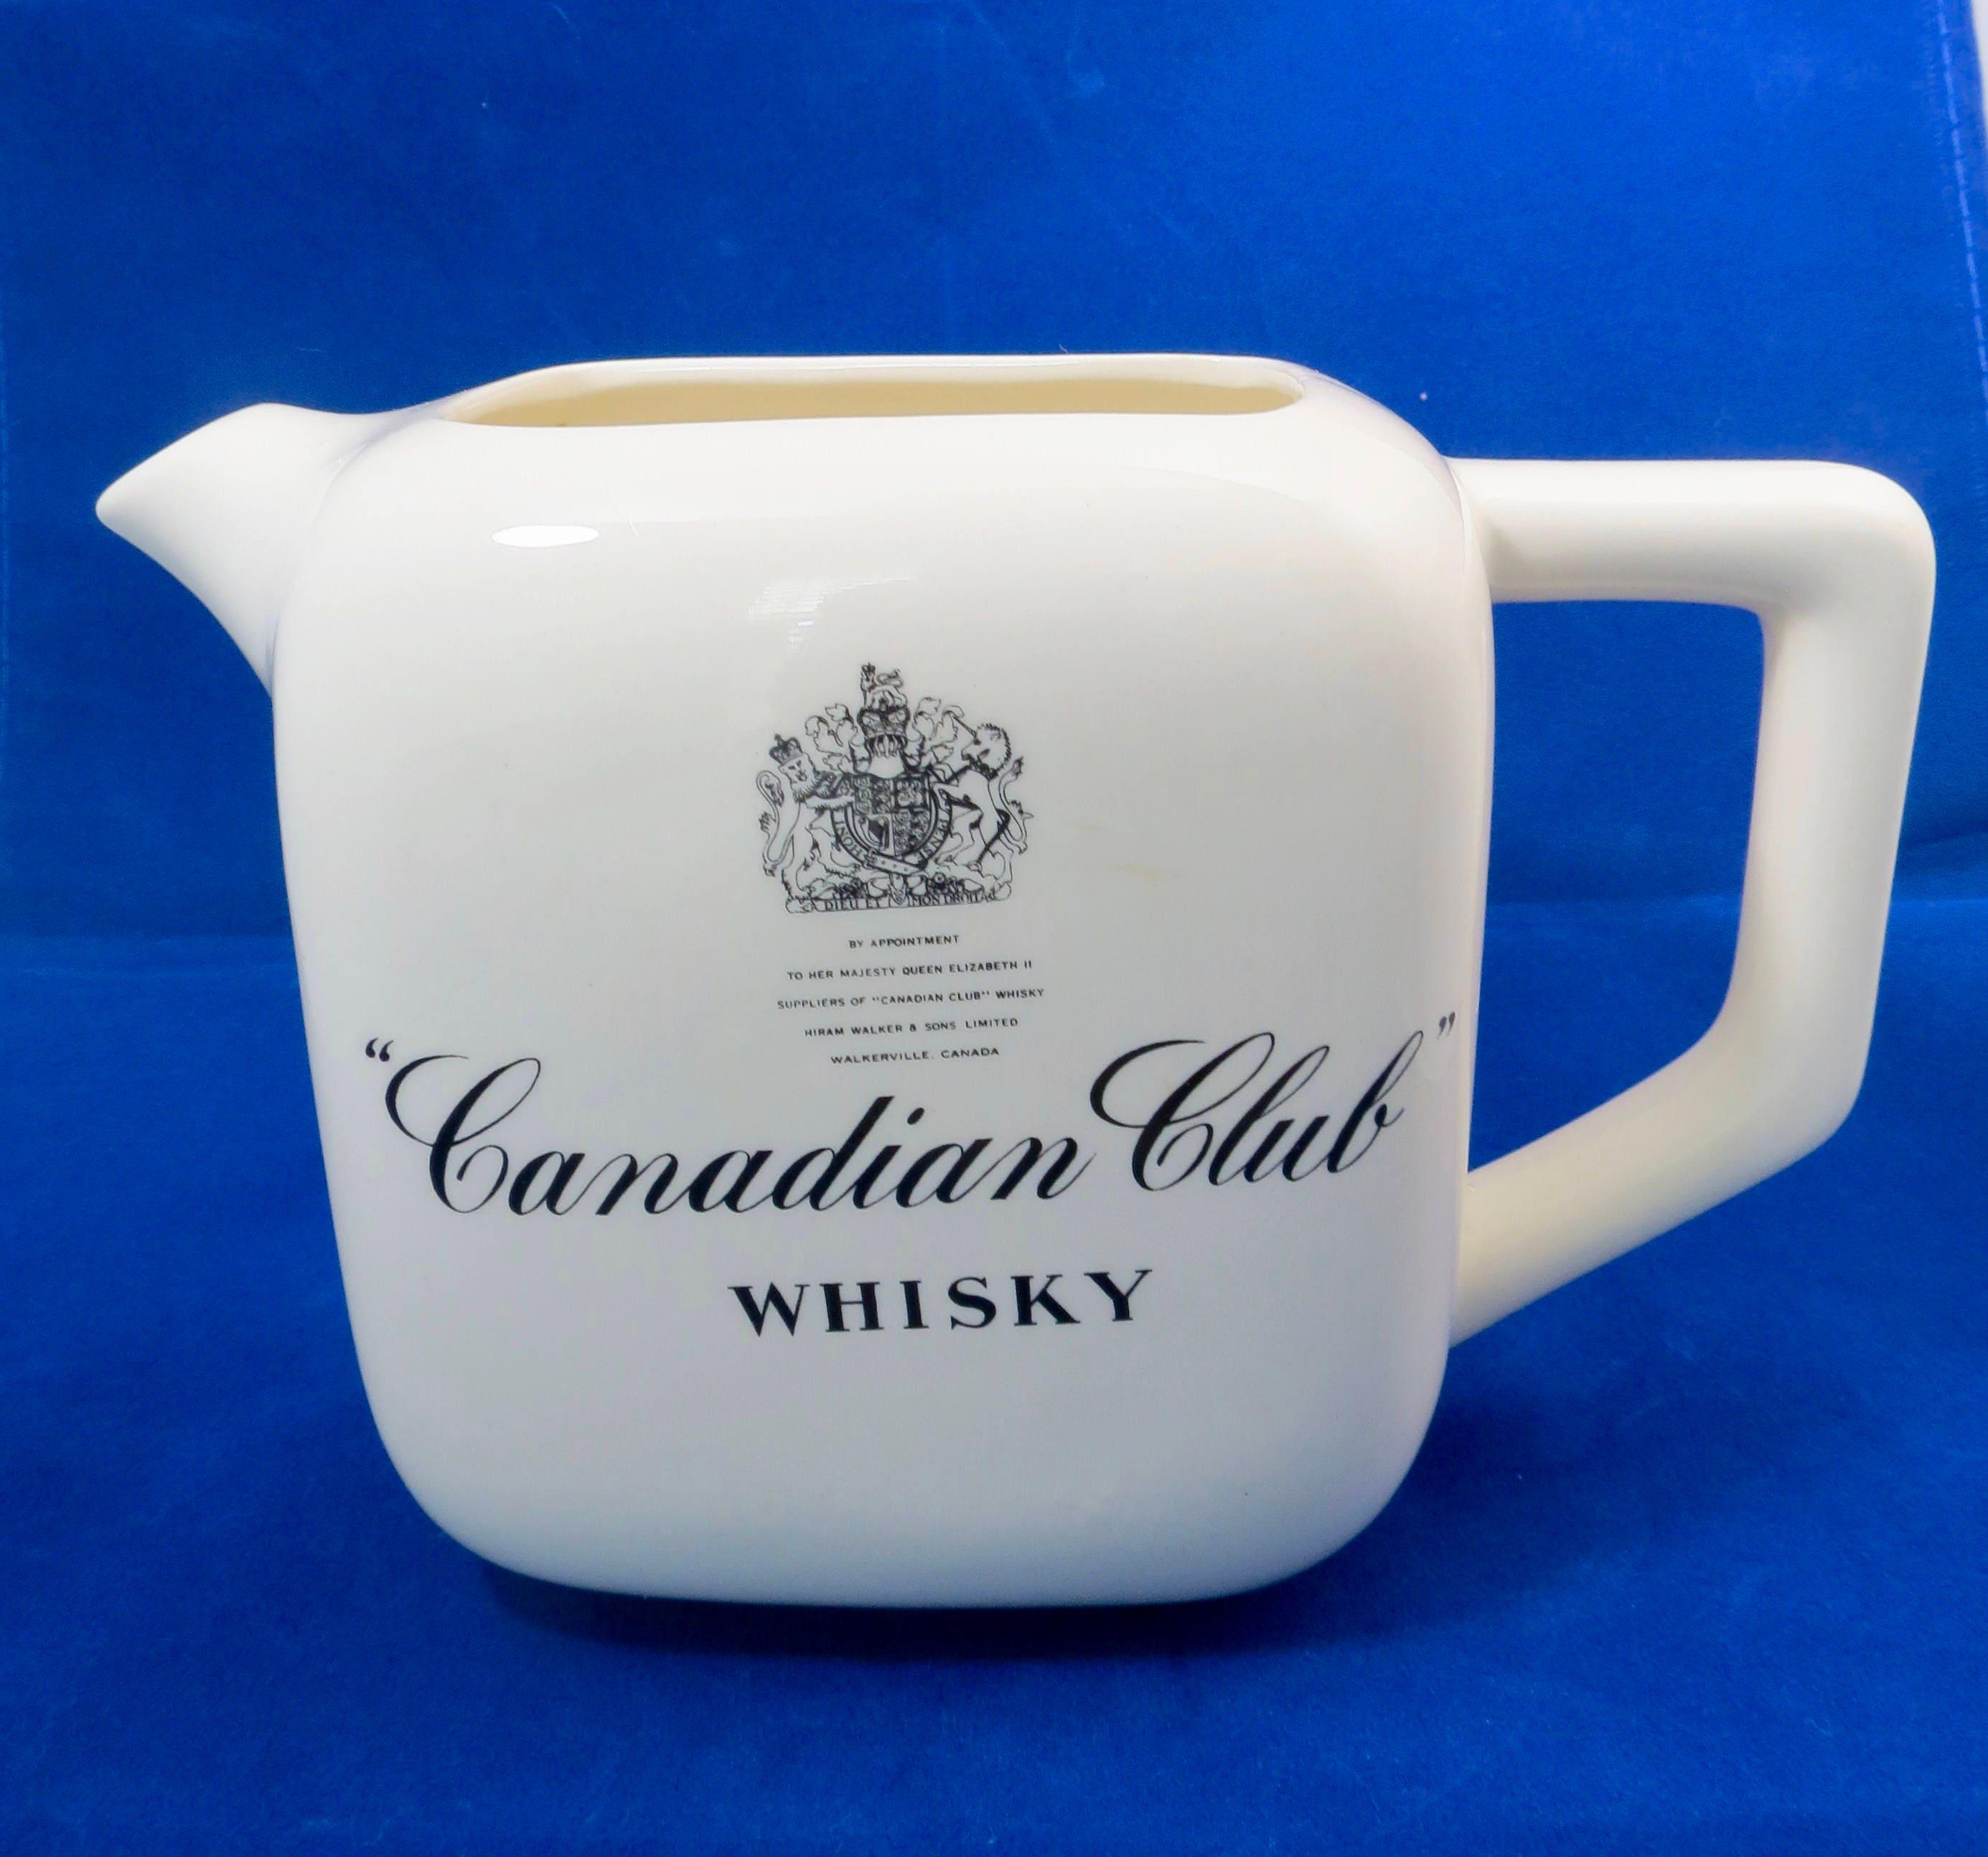 Vintage Canadian Club Whisky Pub Jug